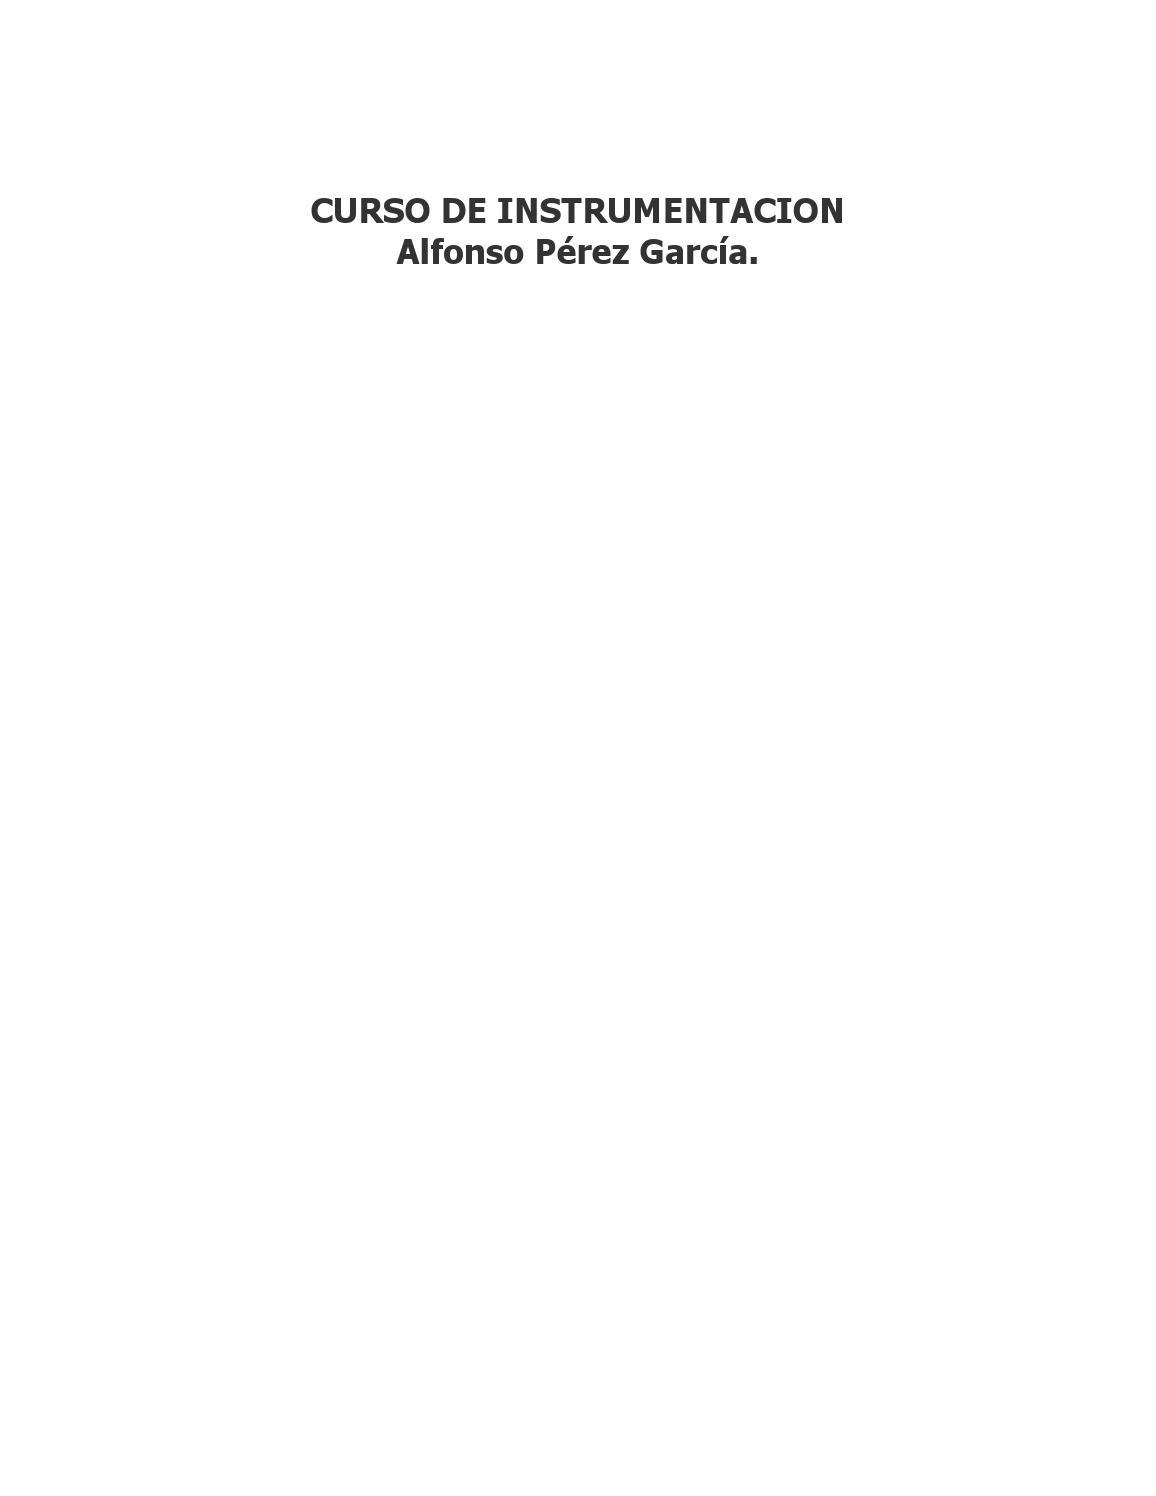 2 X Negro pequeño ángulo terminal Aislantes boot//cover-Lucas Rist Tipo